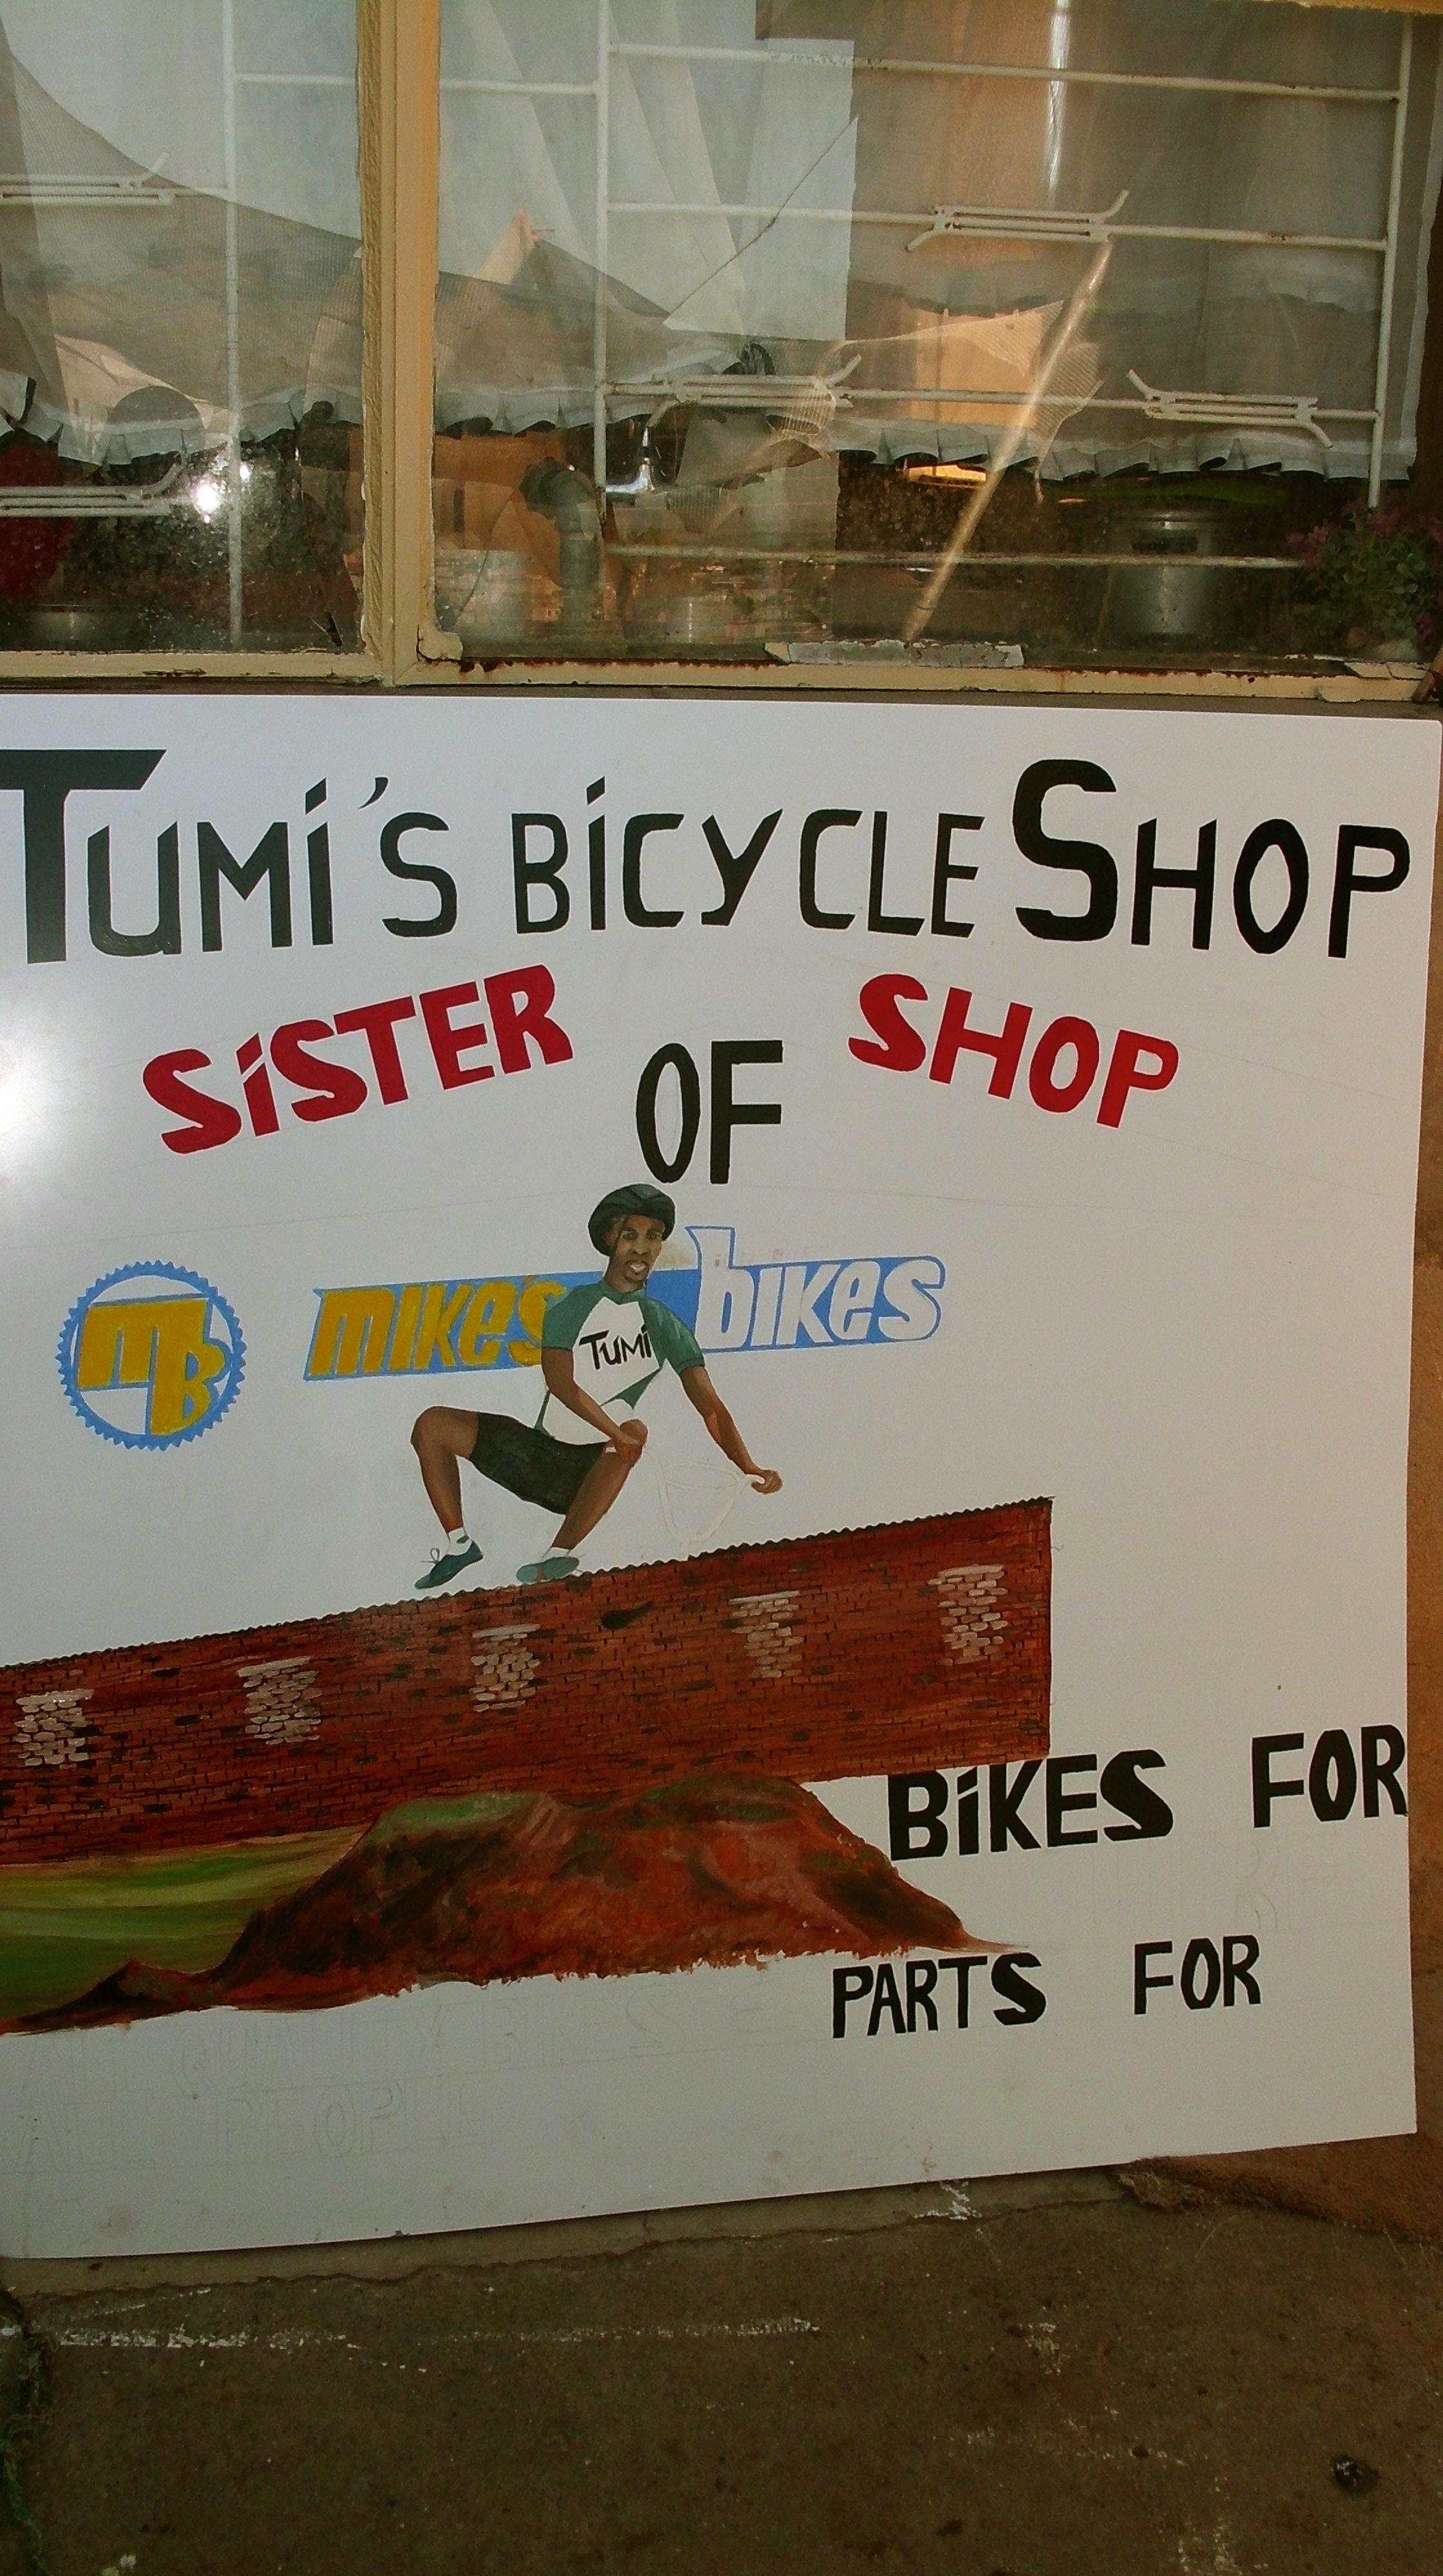 Tumi's Bicycle Shop